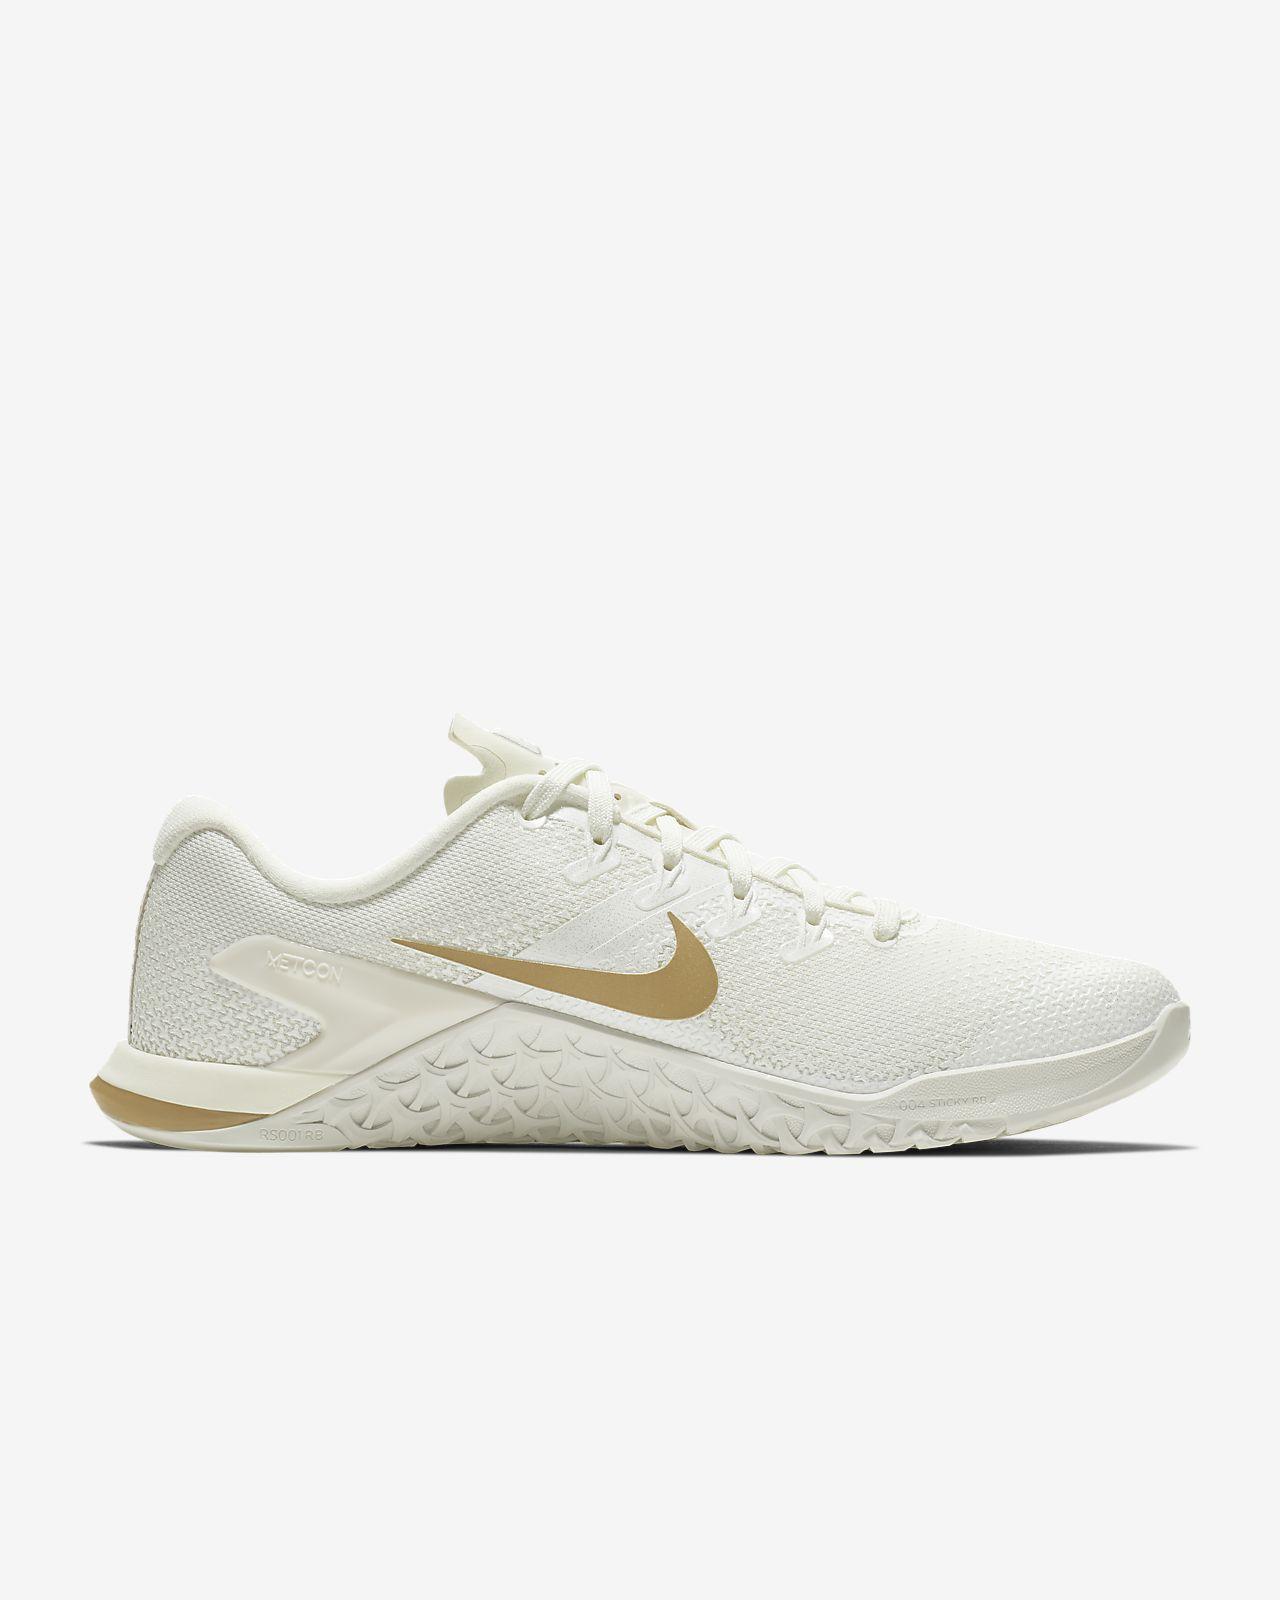 e36bb6d91487c ... Nike Metcon 4 Champagne Women's Cross-Training/Weightlifting Shoe